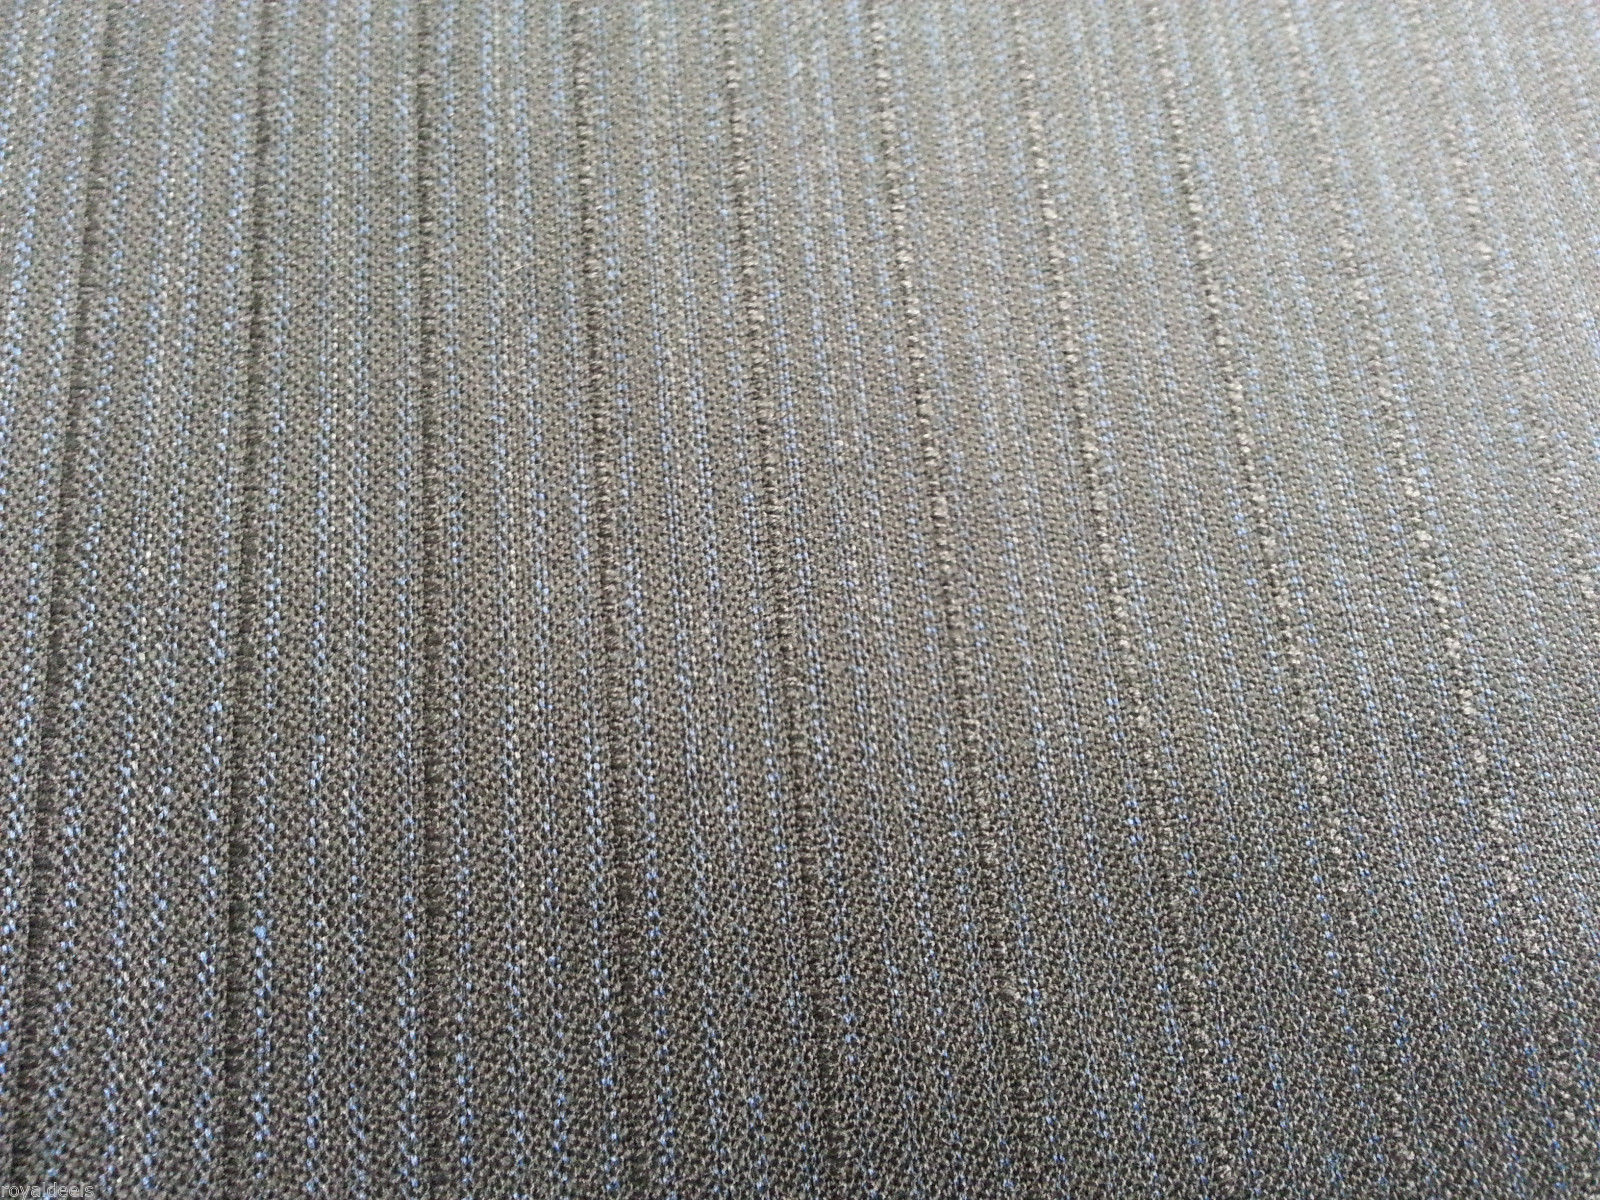 13 Yard Super fine Blue Black 120'S English wool suit fabric By Fairglow